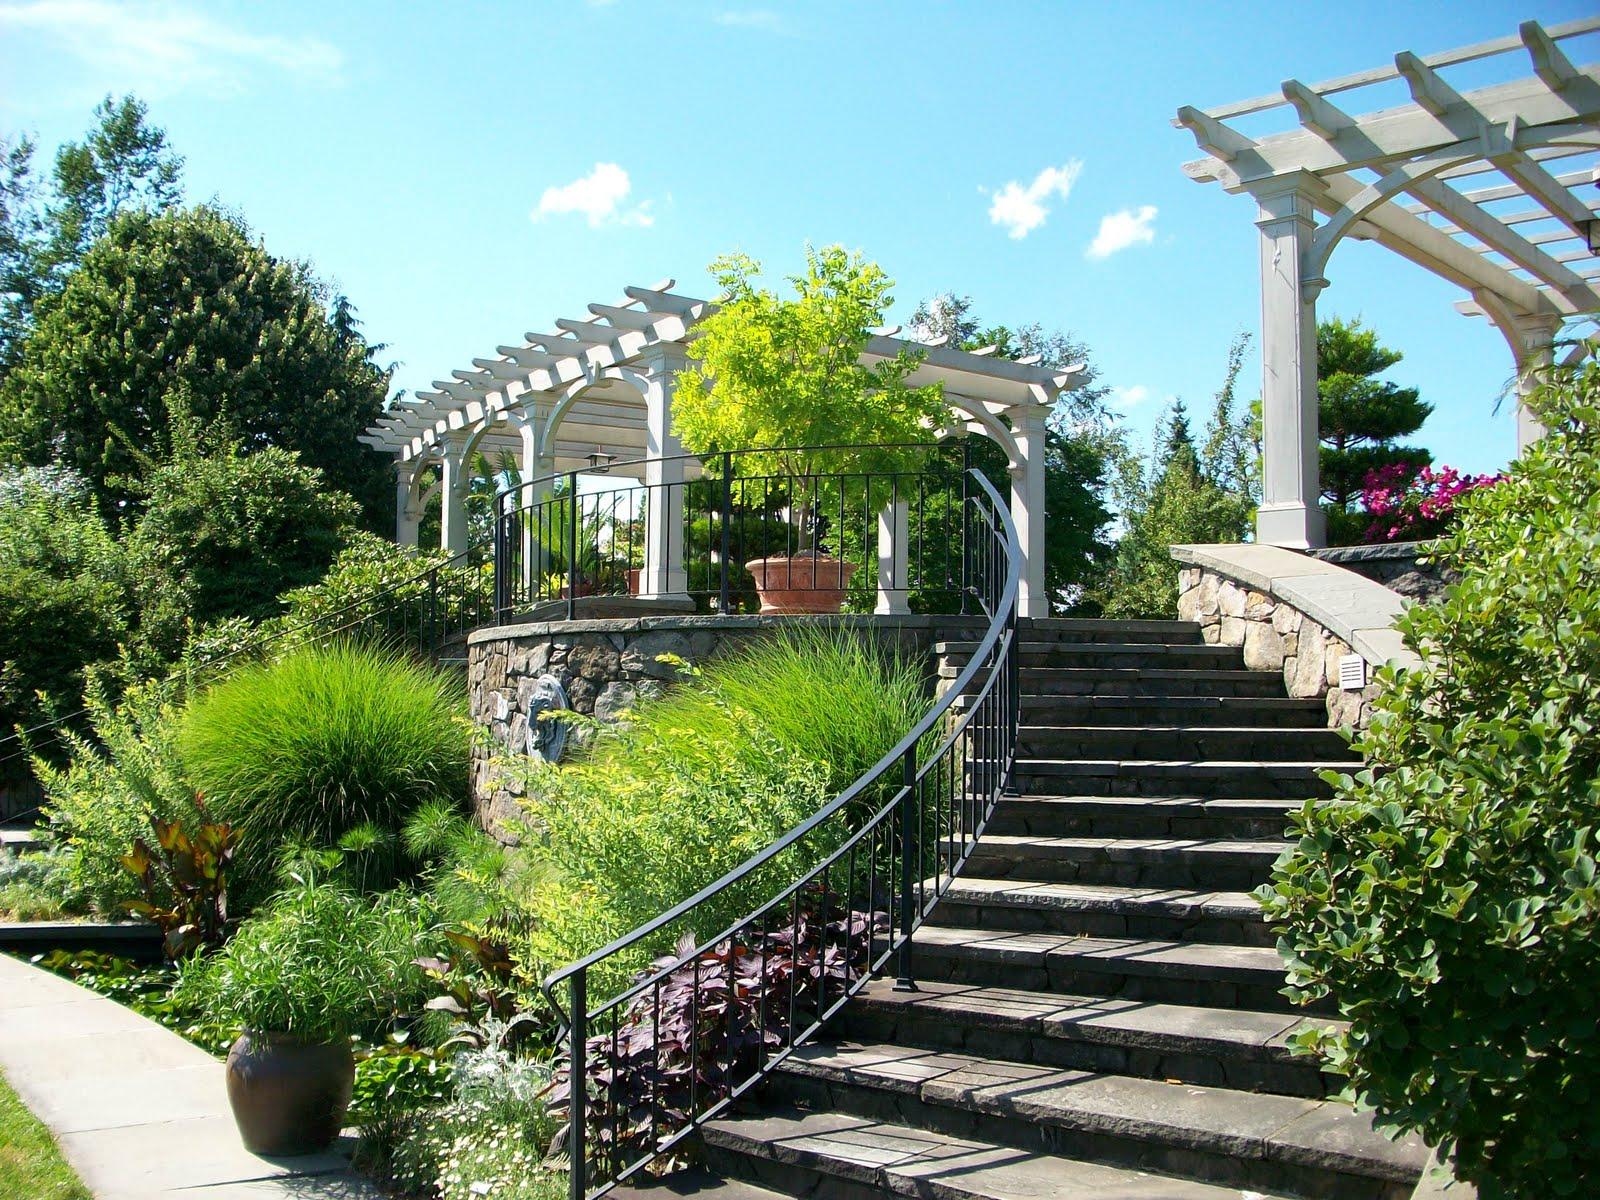 Kelly 39 S Randomness Tower Hill Botanical Garden Boylston Ma 7 17 10